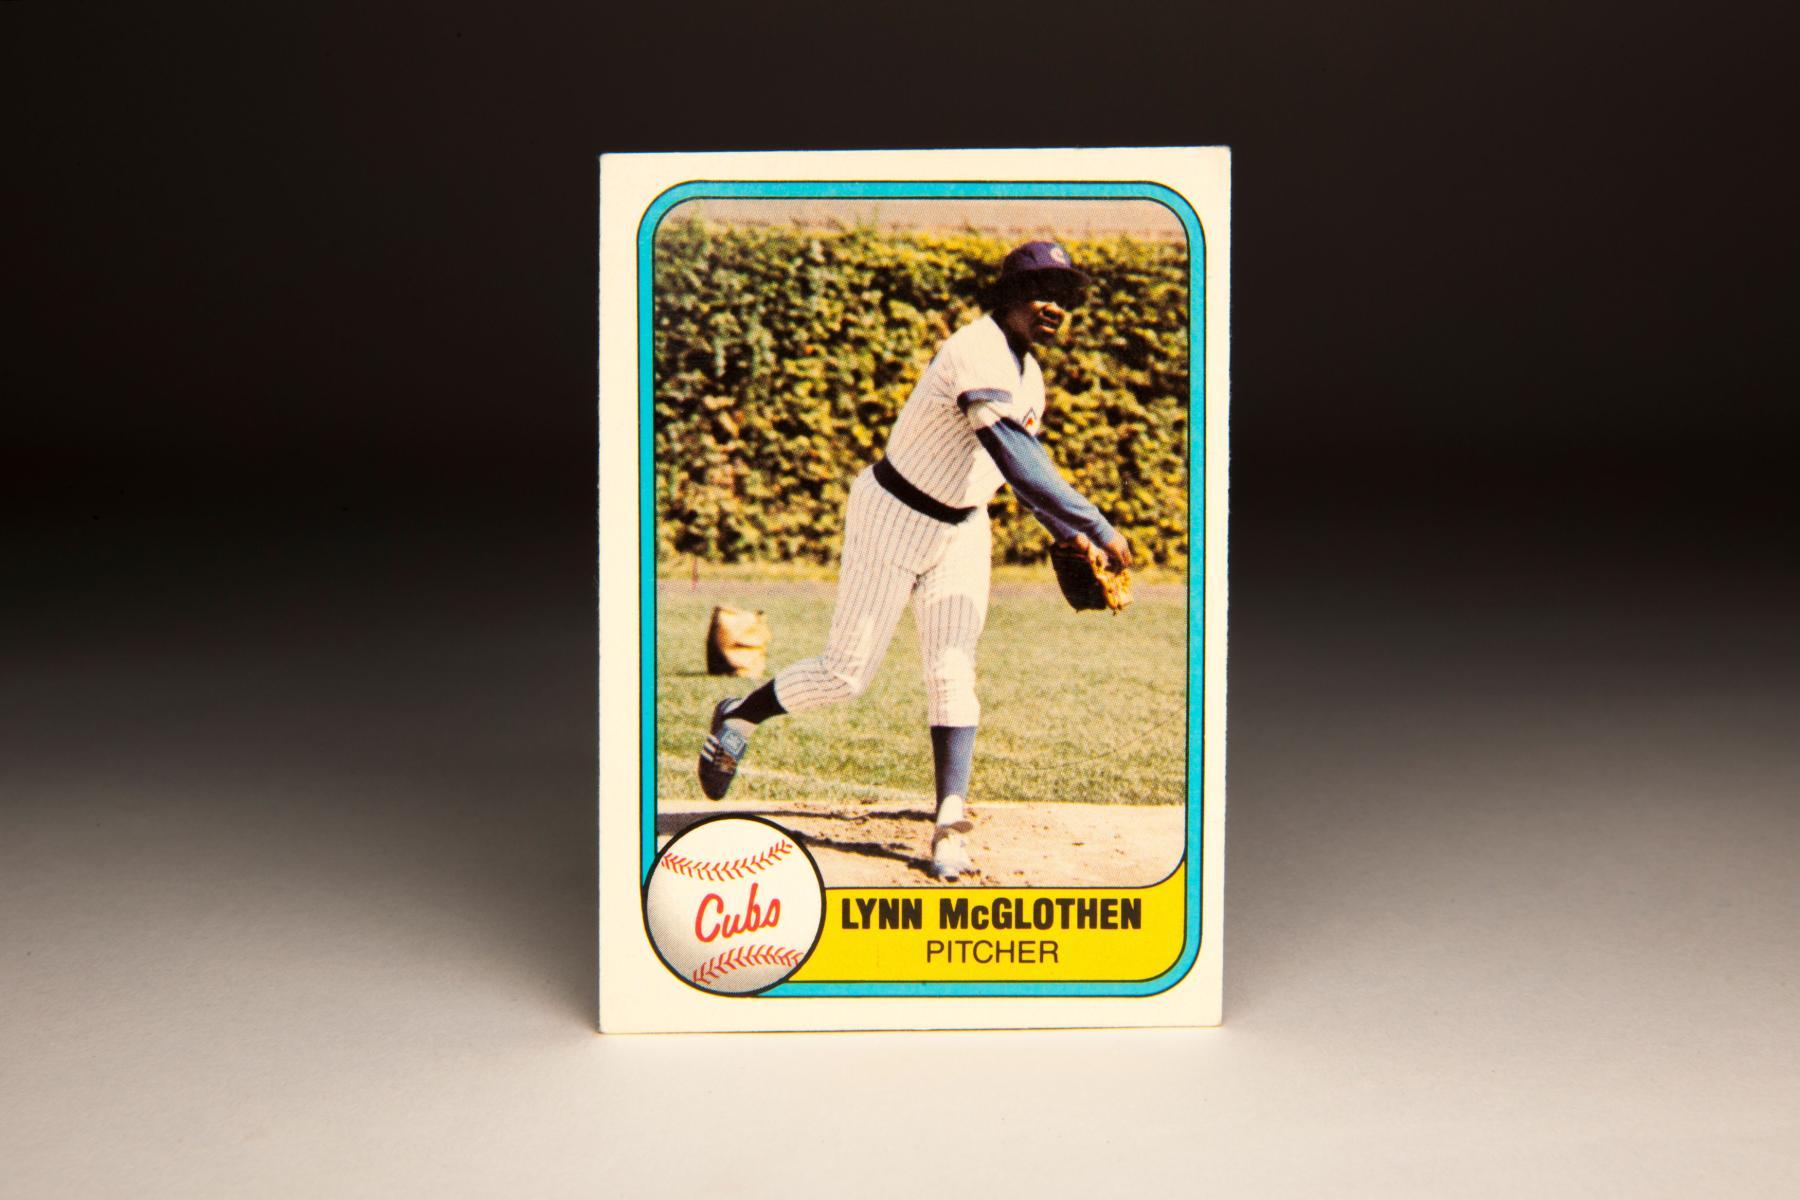 1981 Lynn McGlothen Fleer card. (Milo Stewart Jr. / National Baseball Hall of Fame)